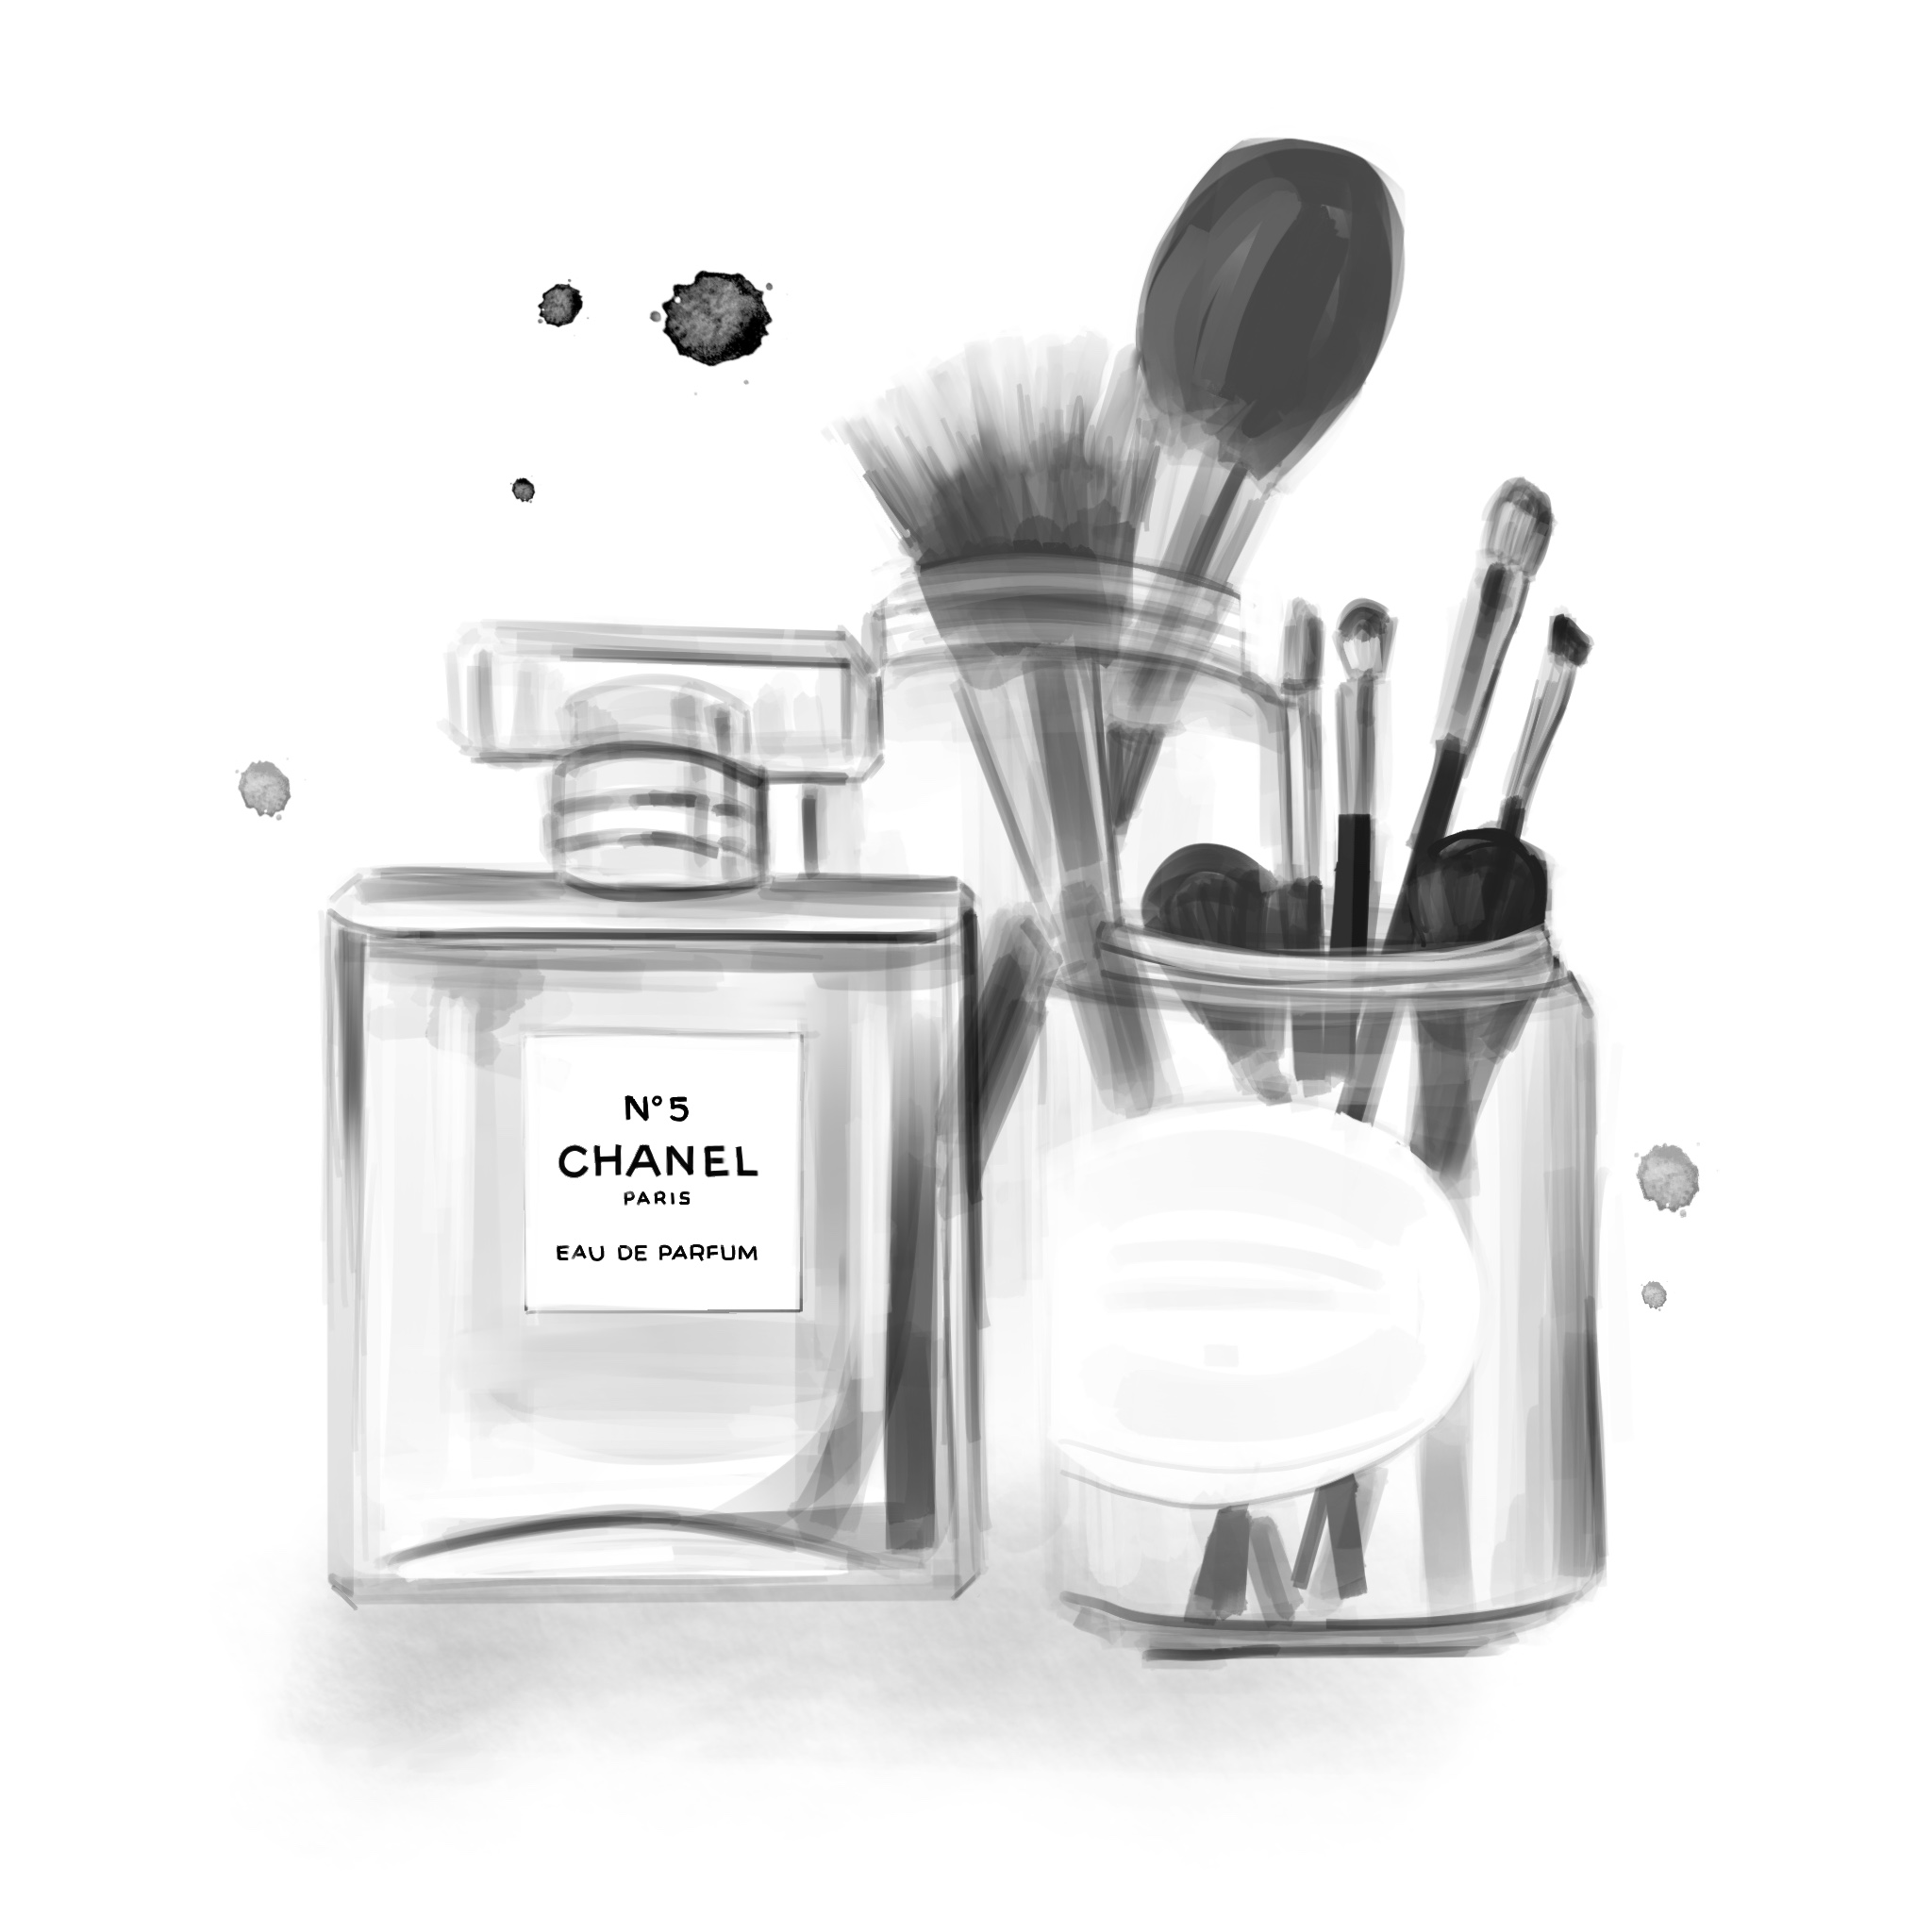 chanel-bandw-beauty-illustration-by-stephanie-anne.jpg